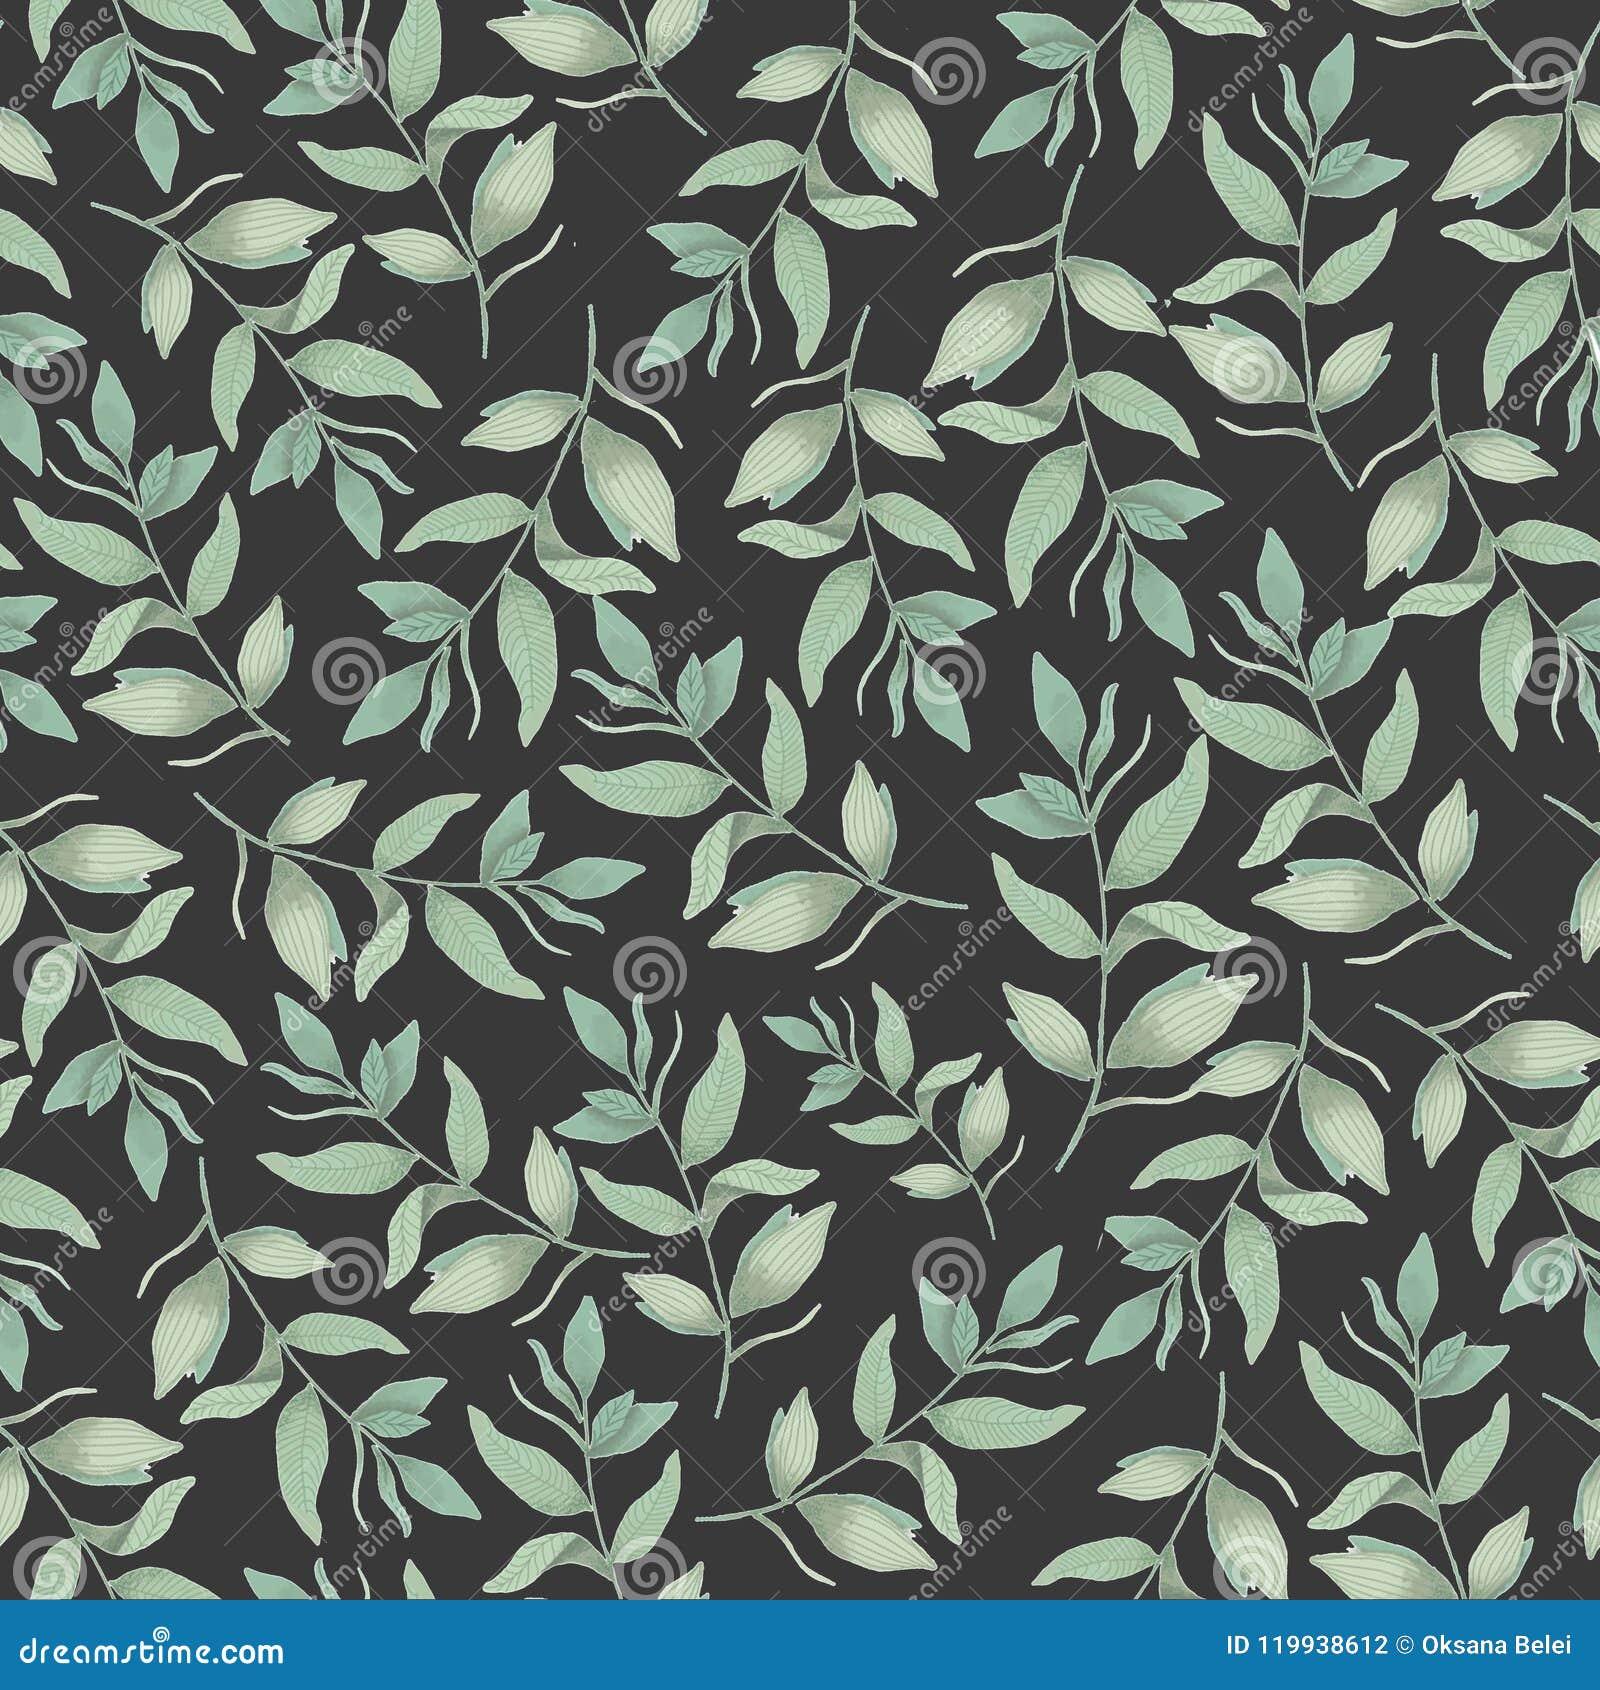 Modelo botánico inconsútil, fondo para las telas, materias textiles, papel, papel pintado